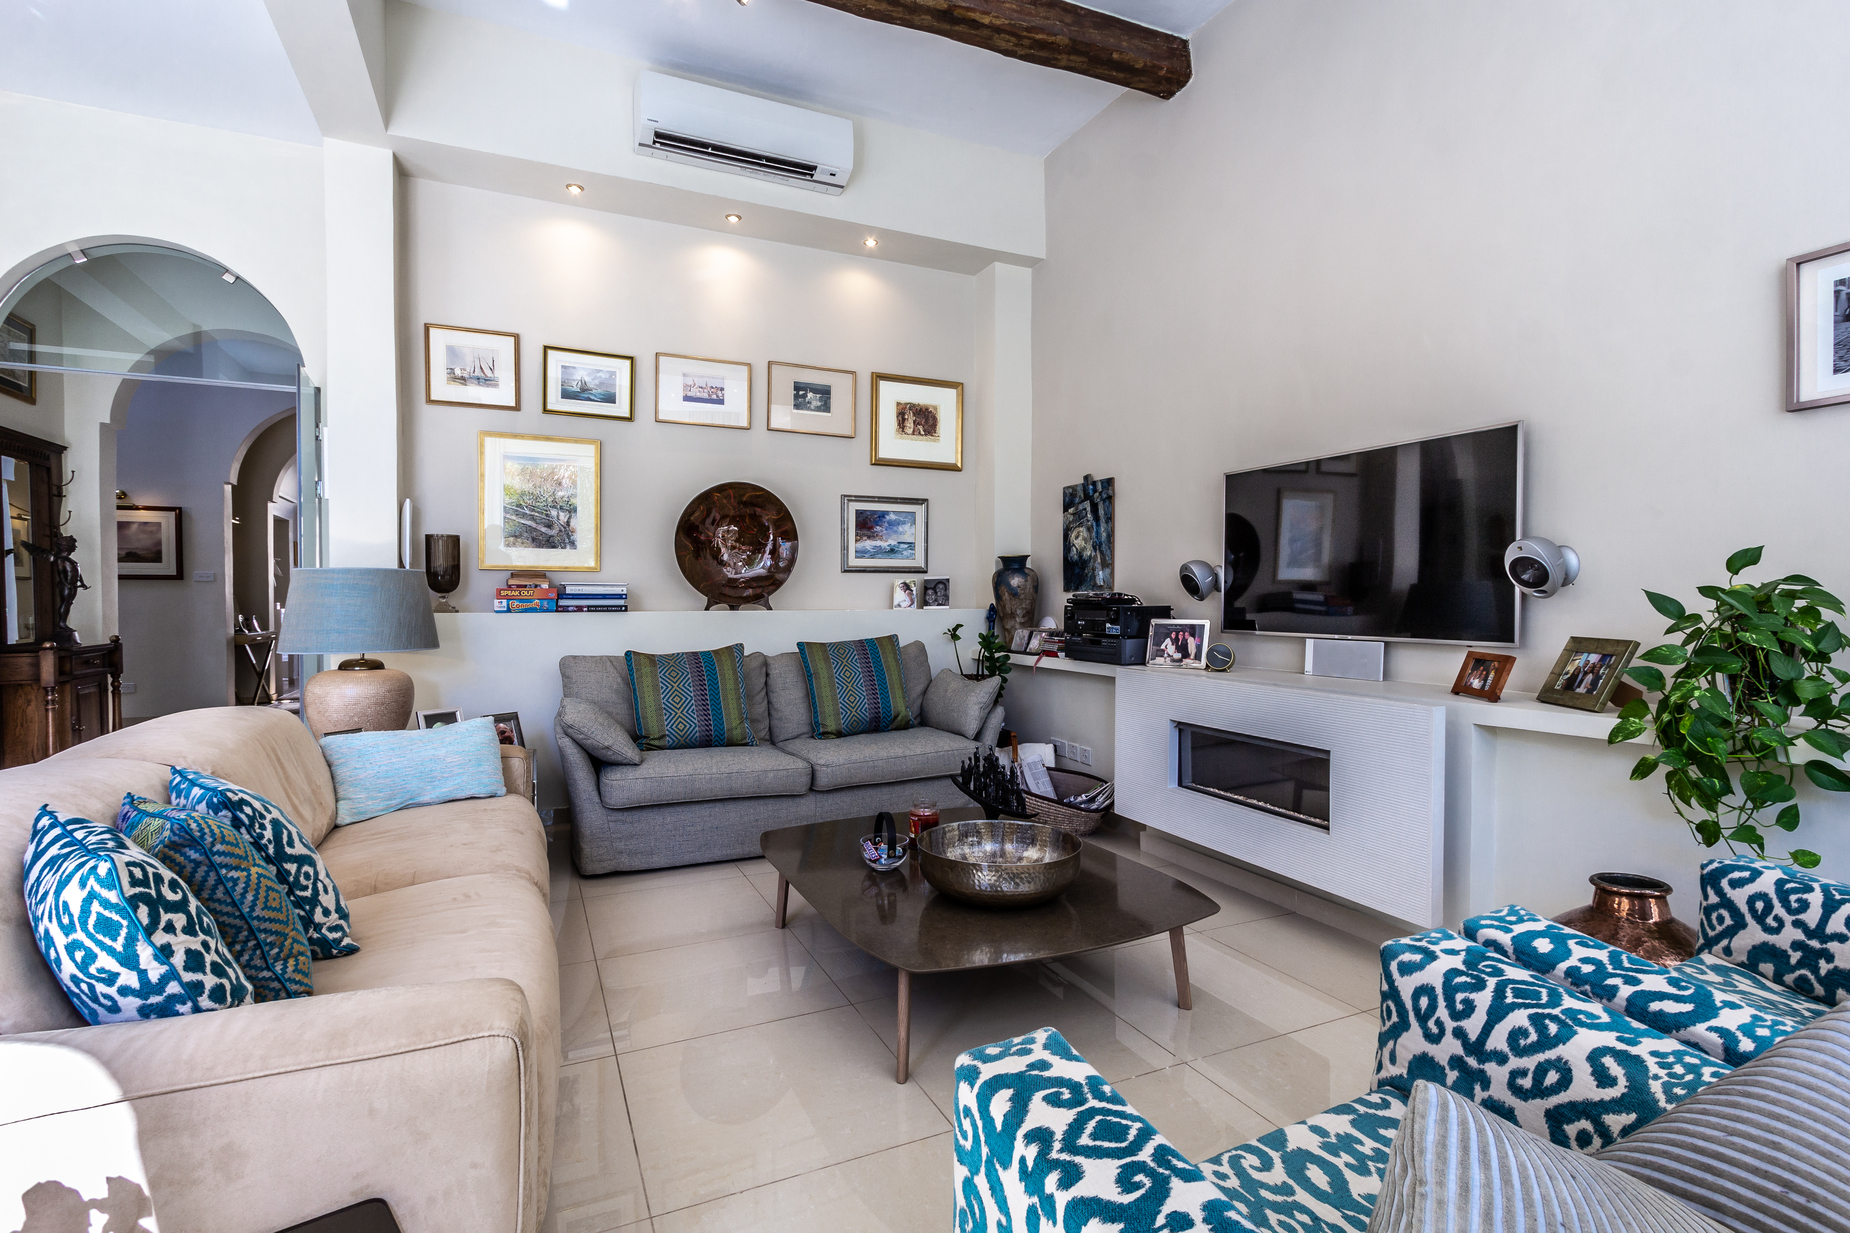 3 bed Town House For Sale in Balzan, Balzan - thumb 12